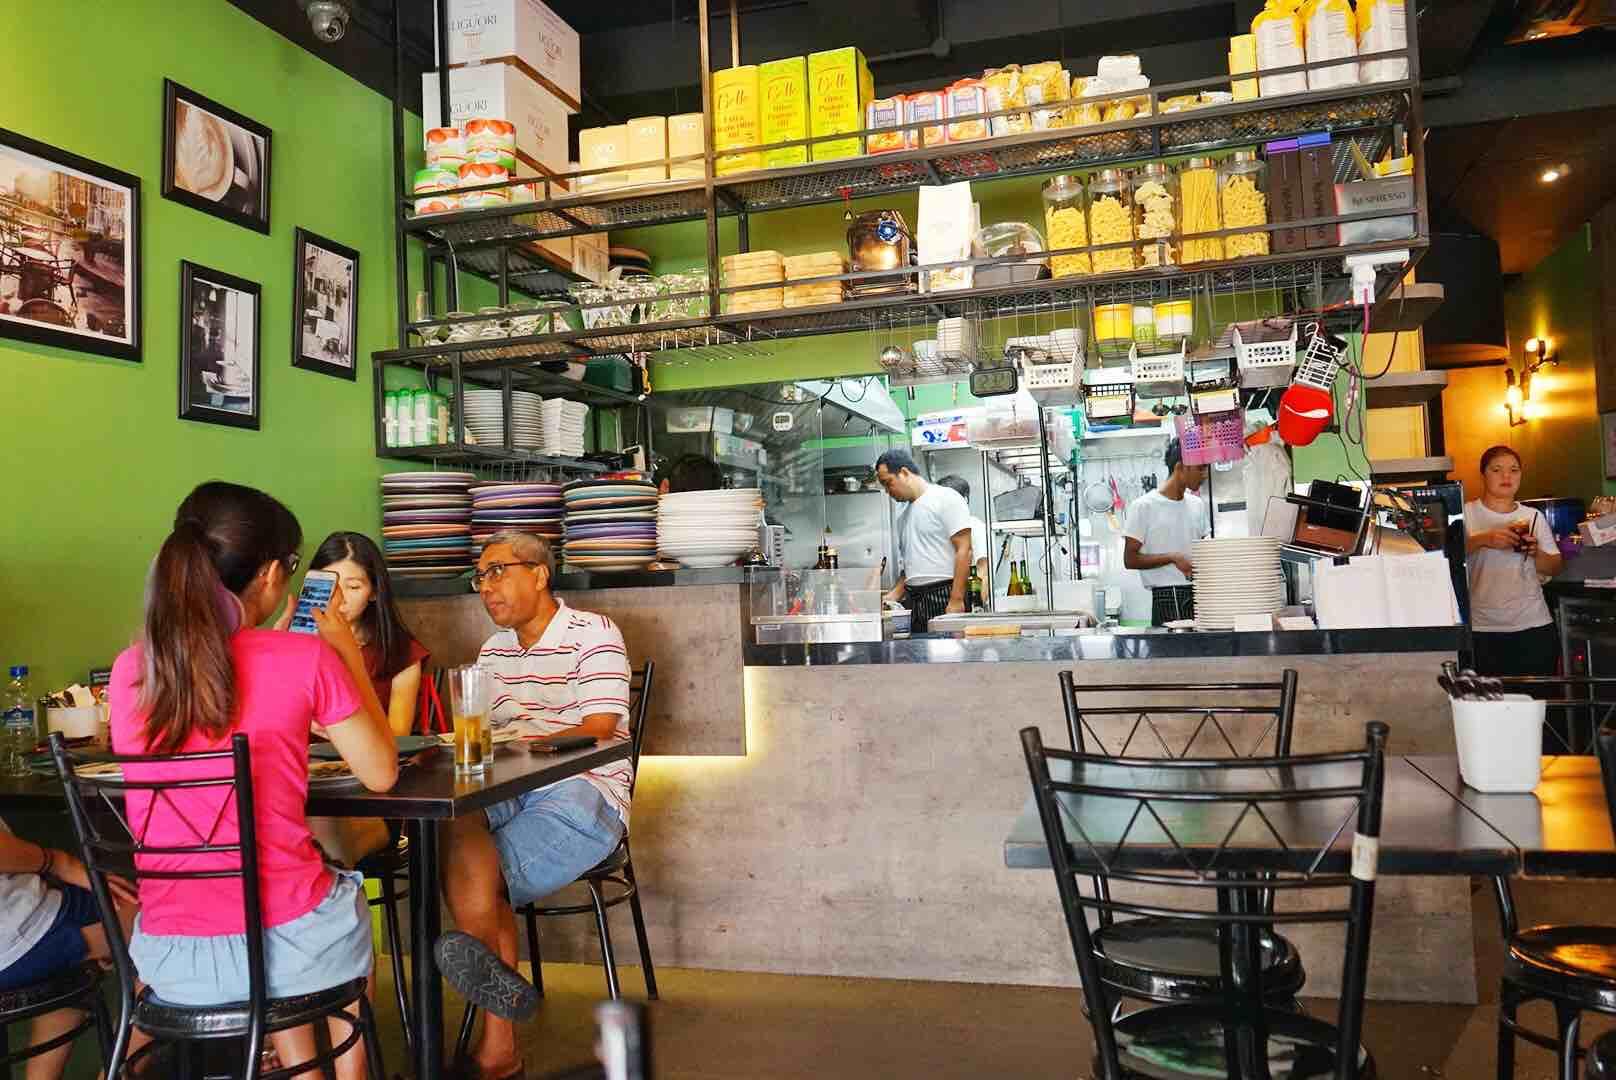 PocoLoco Singapore Restaurant Interiors - AspirantSG